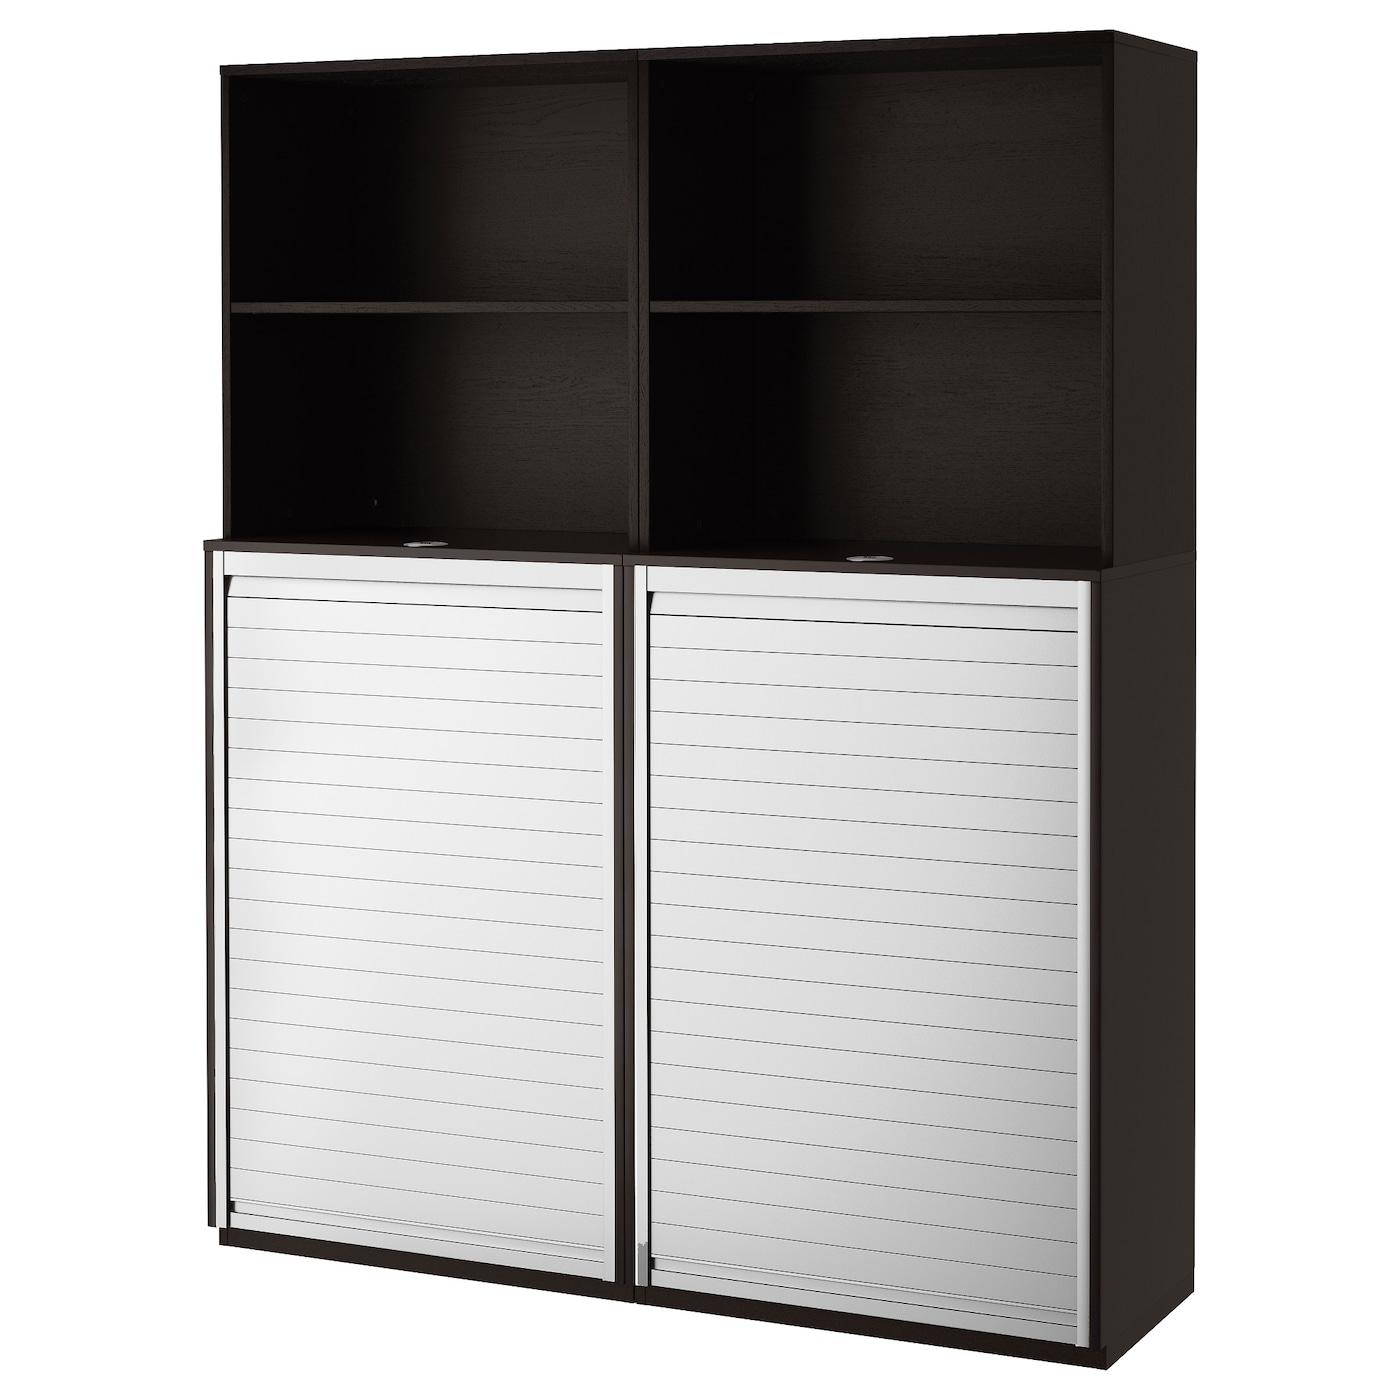 Ikea Utrusta Led Installation ~ null galant galant inklusive 10 jahre garantie 938 00 siehe